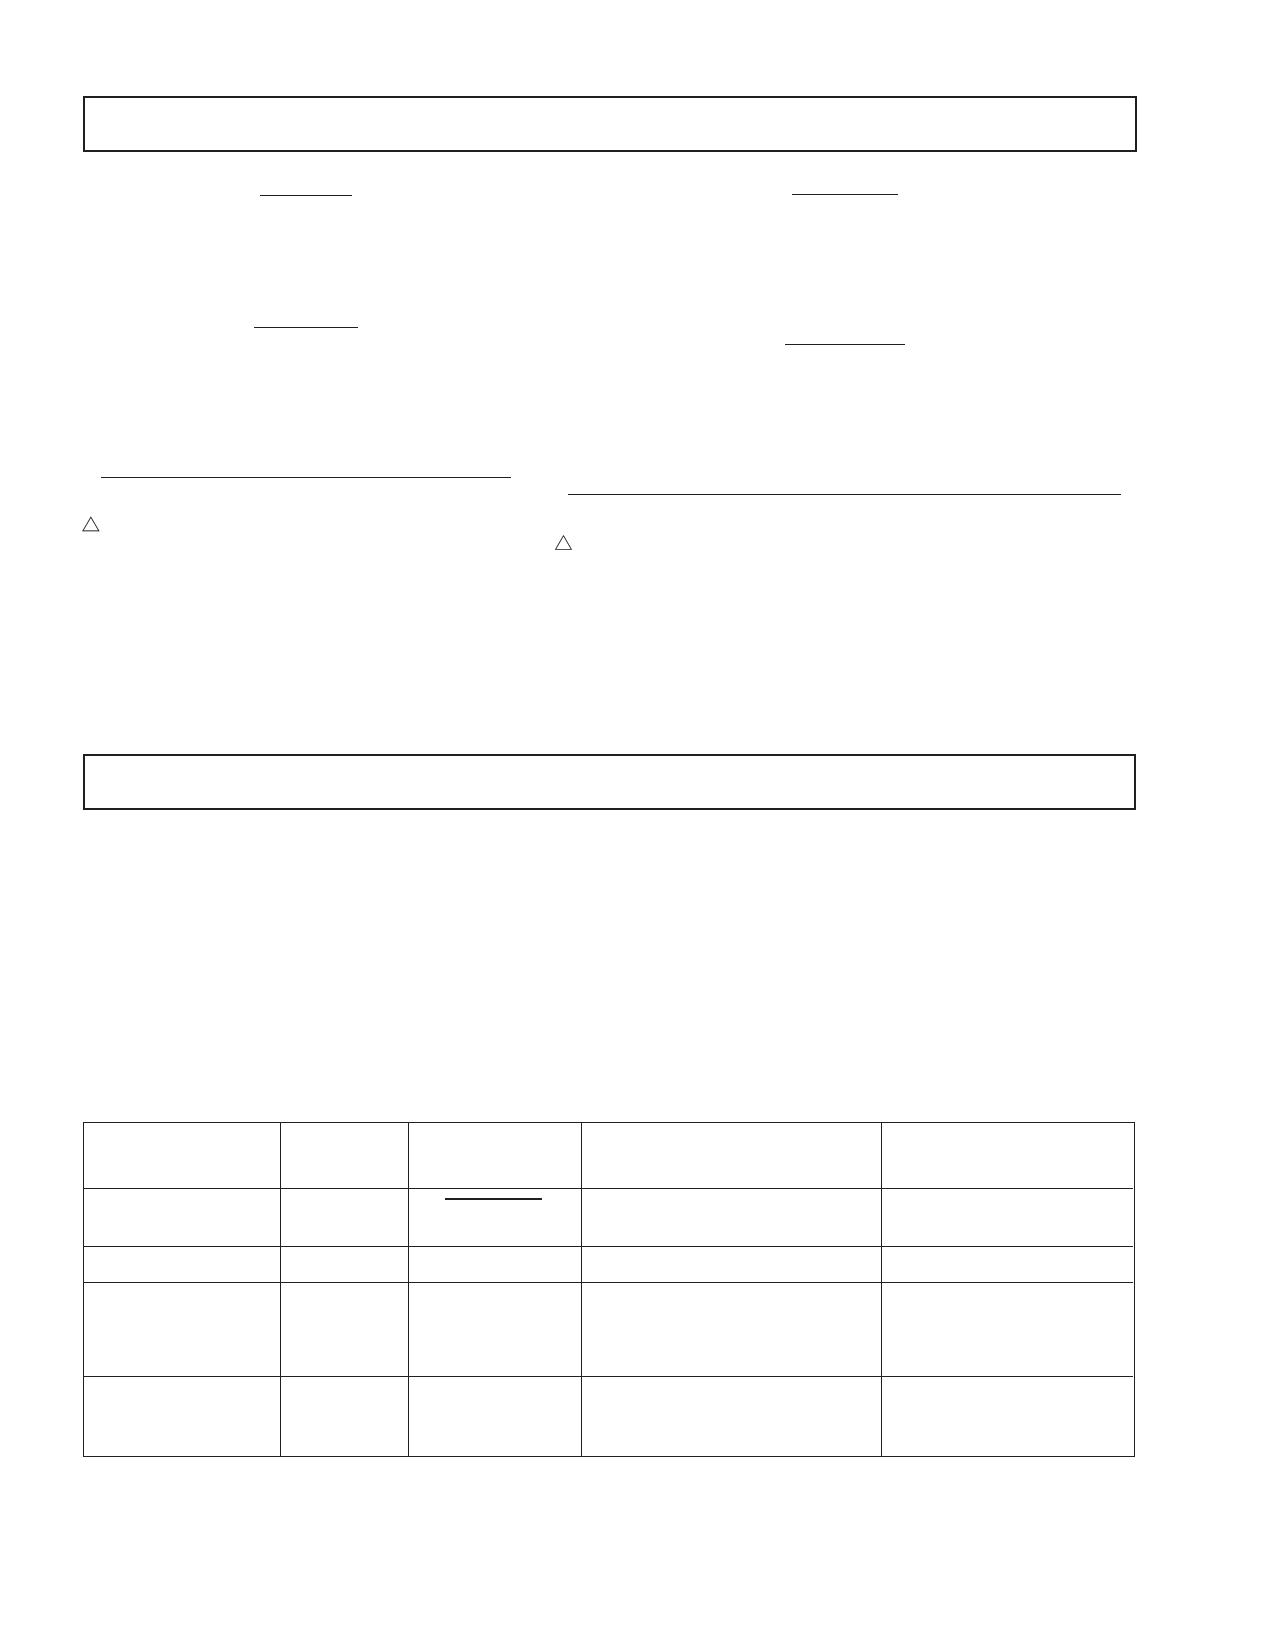 KV-29AL40A pdf, 반도체, 판매, 대치품